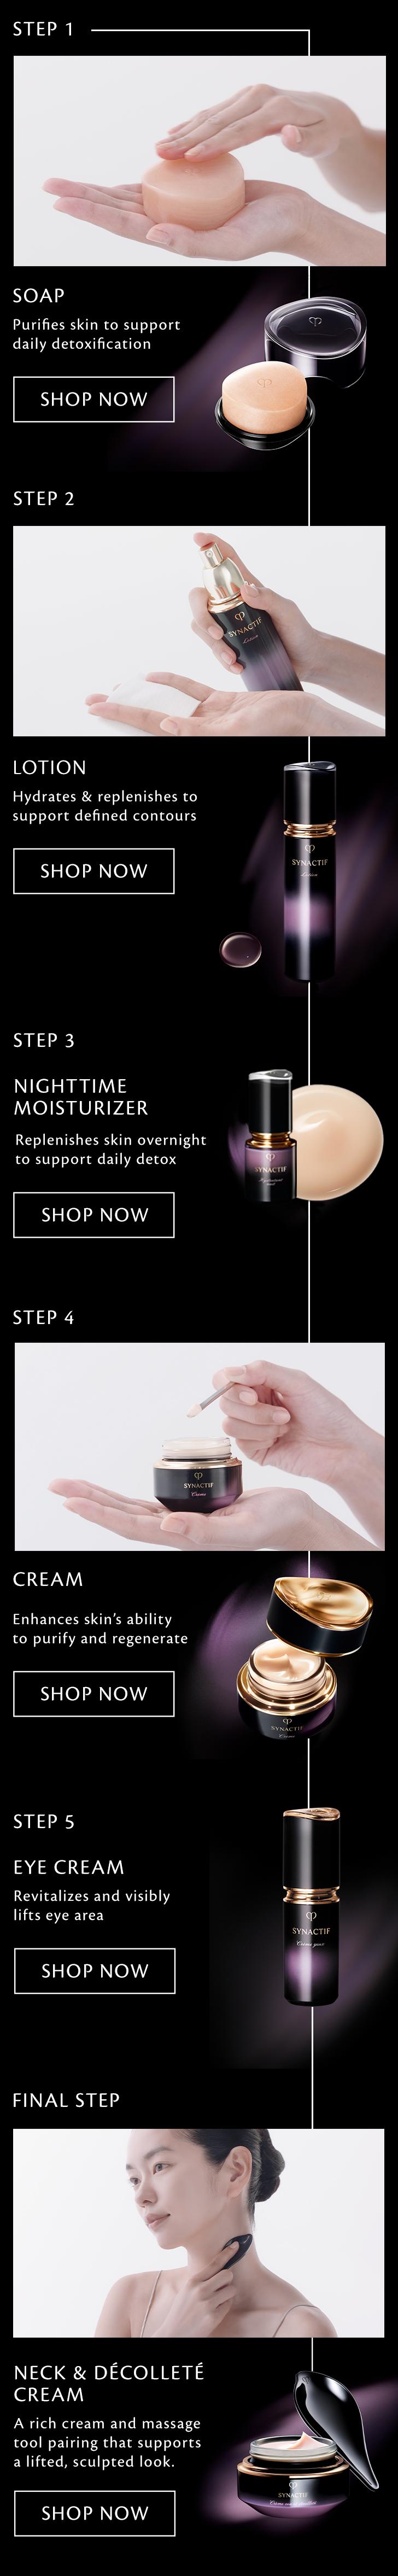 Synactif night regimen products